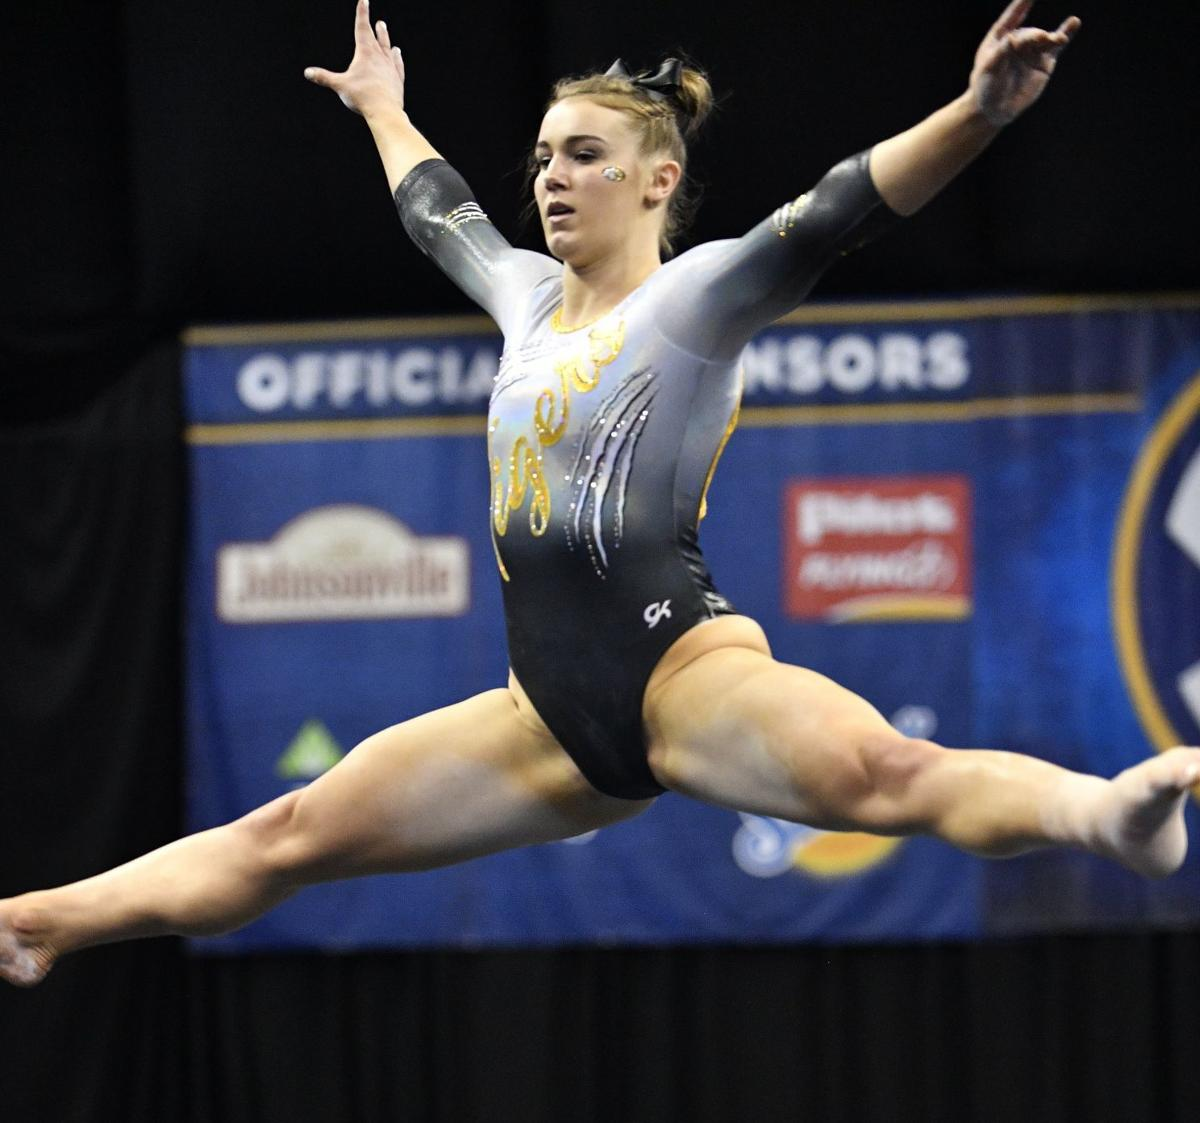 2018 NCAA Gymnastics Championships: Scores, results